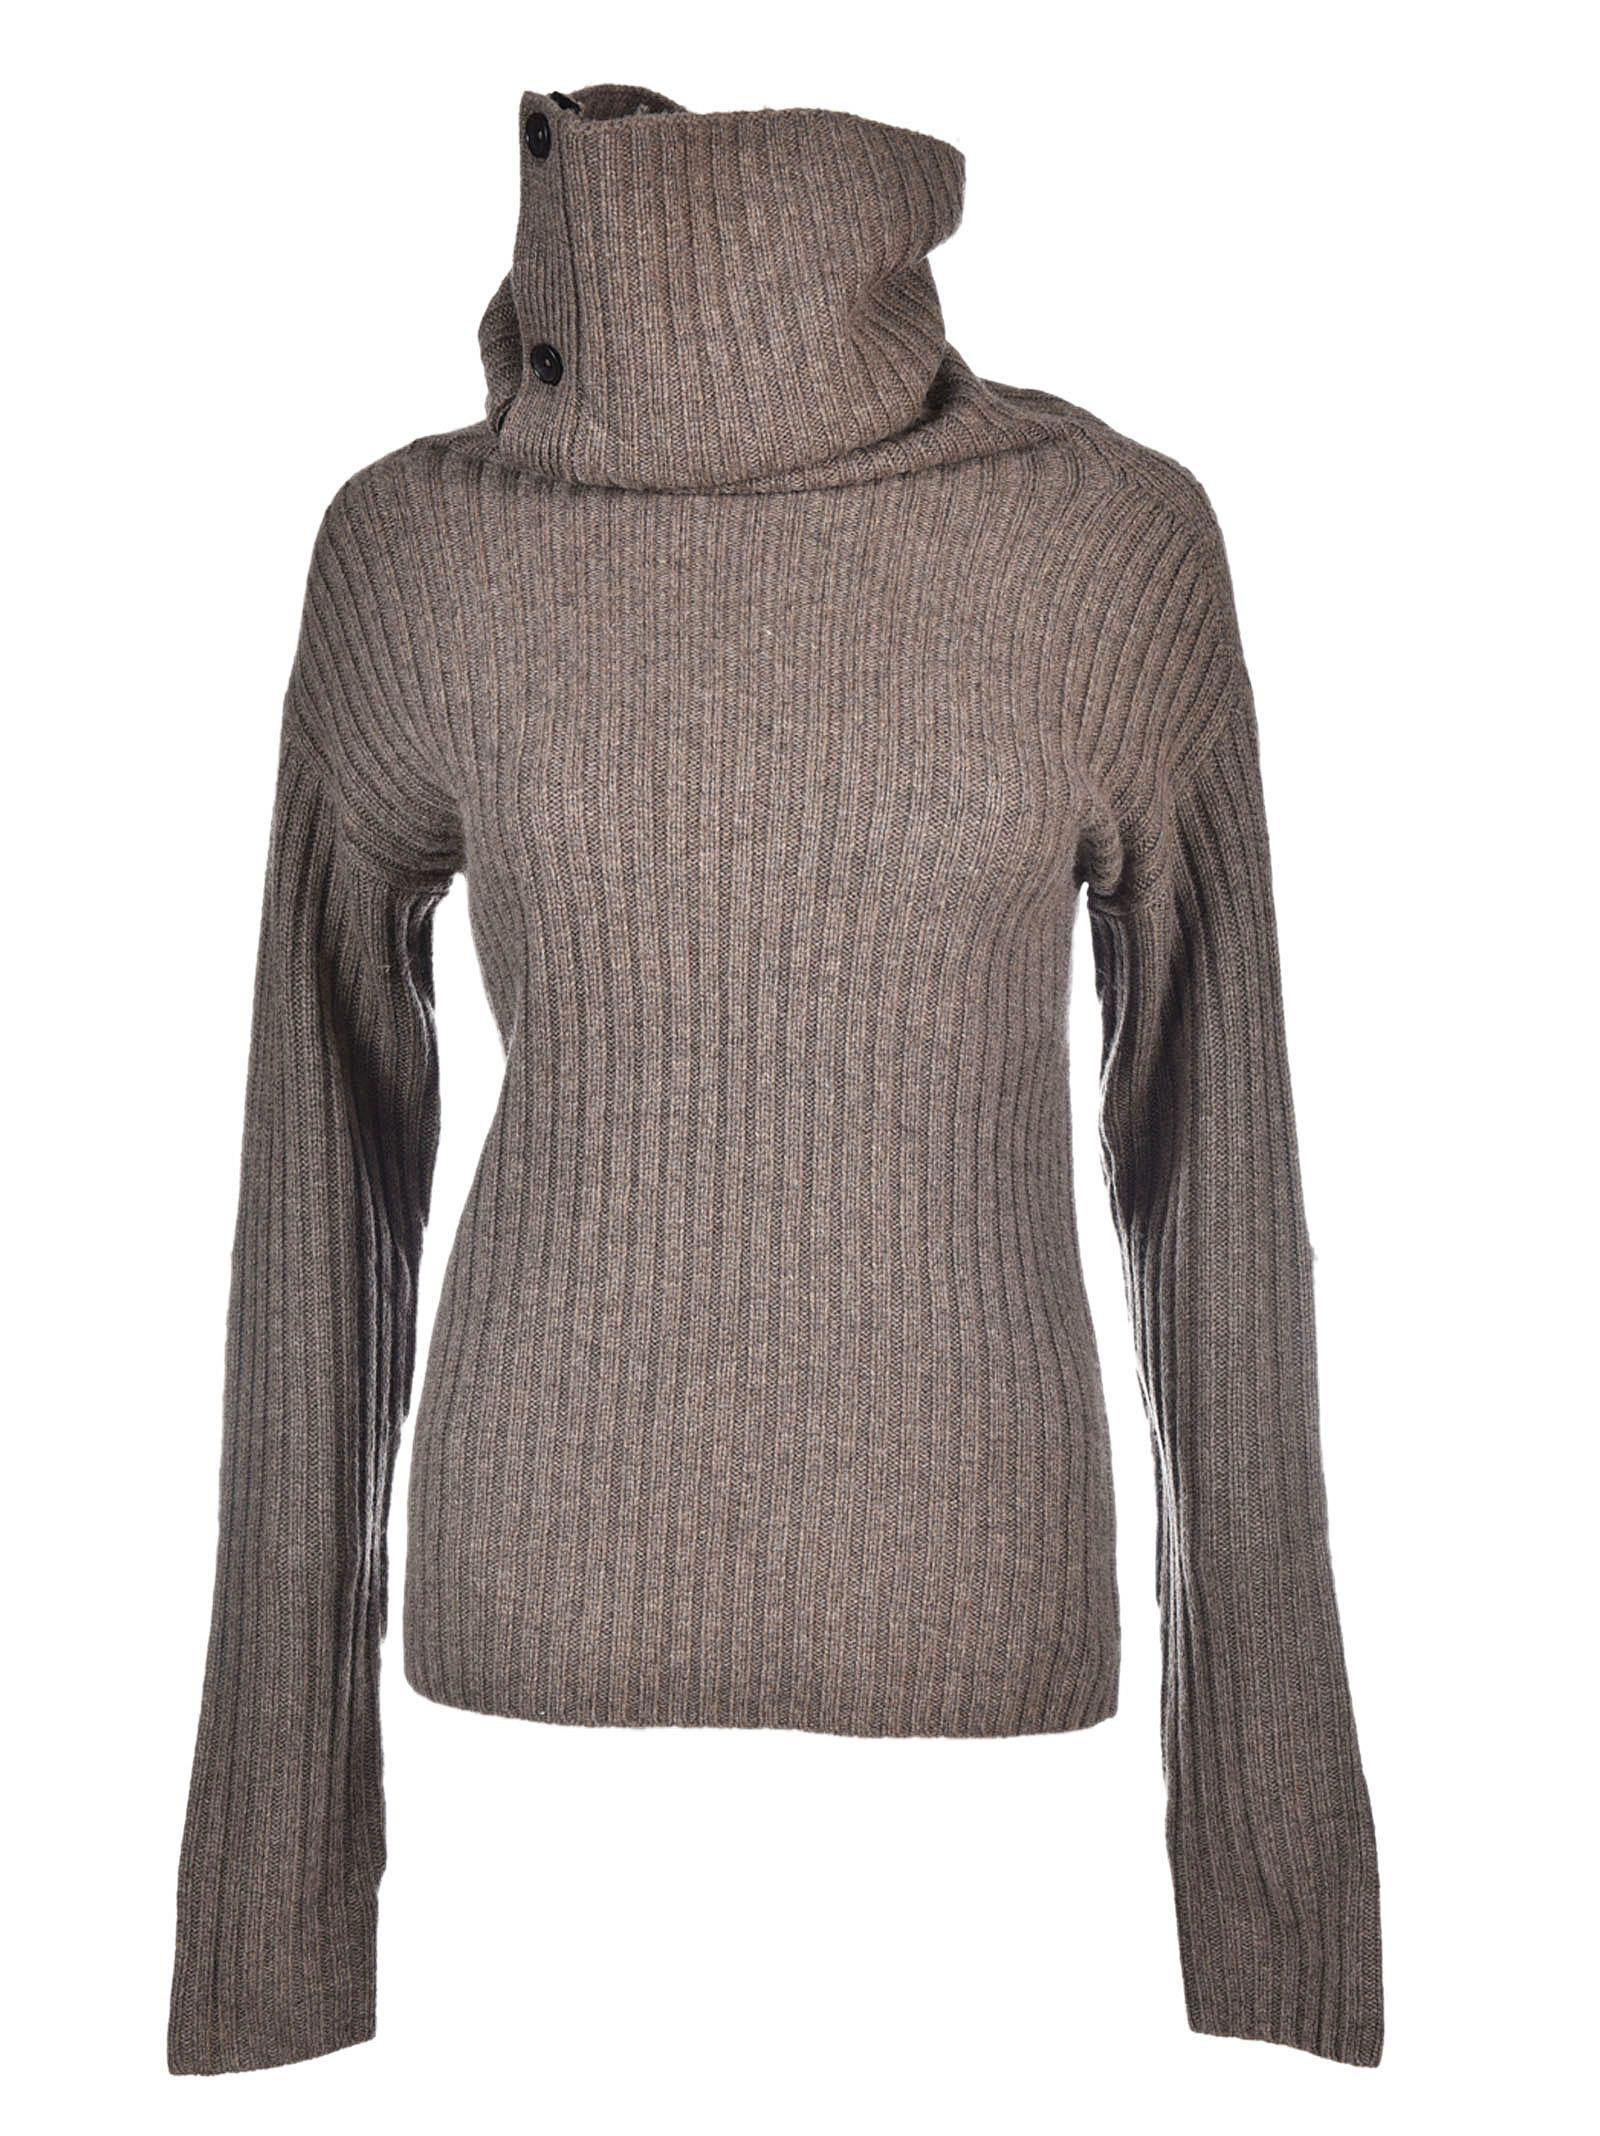 Joseph Joseph Turtleneck Sweater Taupe 8432686 Italist